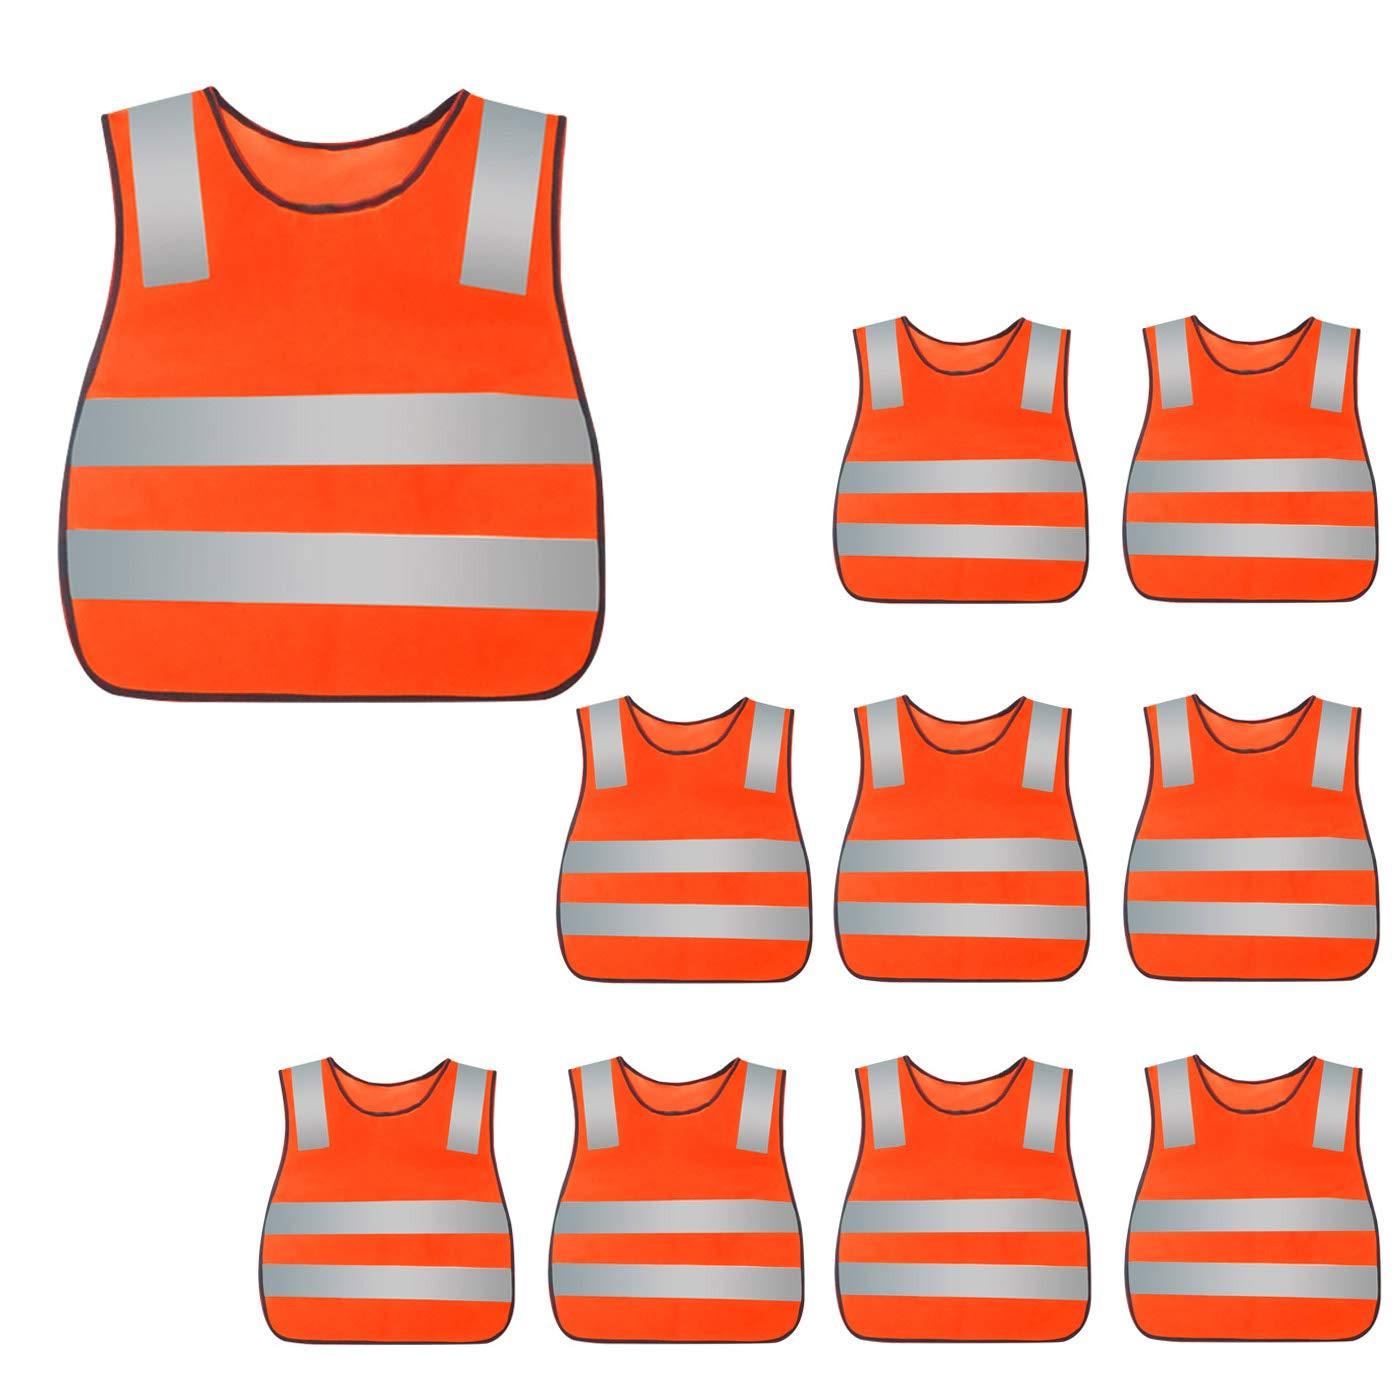 Kids Reflective Vest High Visibility Breathable Vest Bright Color Safety Vest Lightweight Traffic Vest Construction Worker Vest Neon Orange with Reflective Straps 10PCS by AIEOE